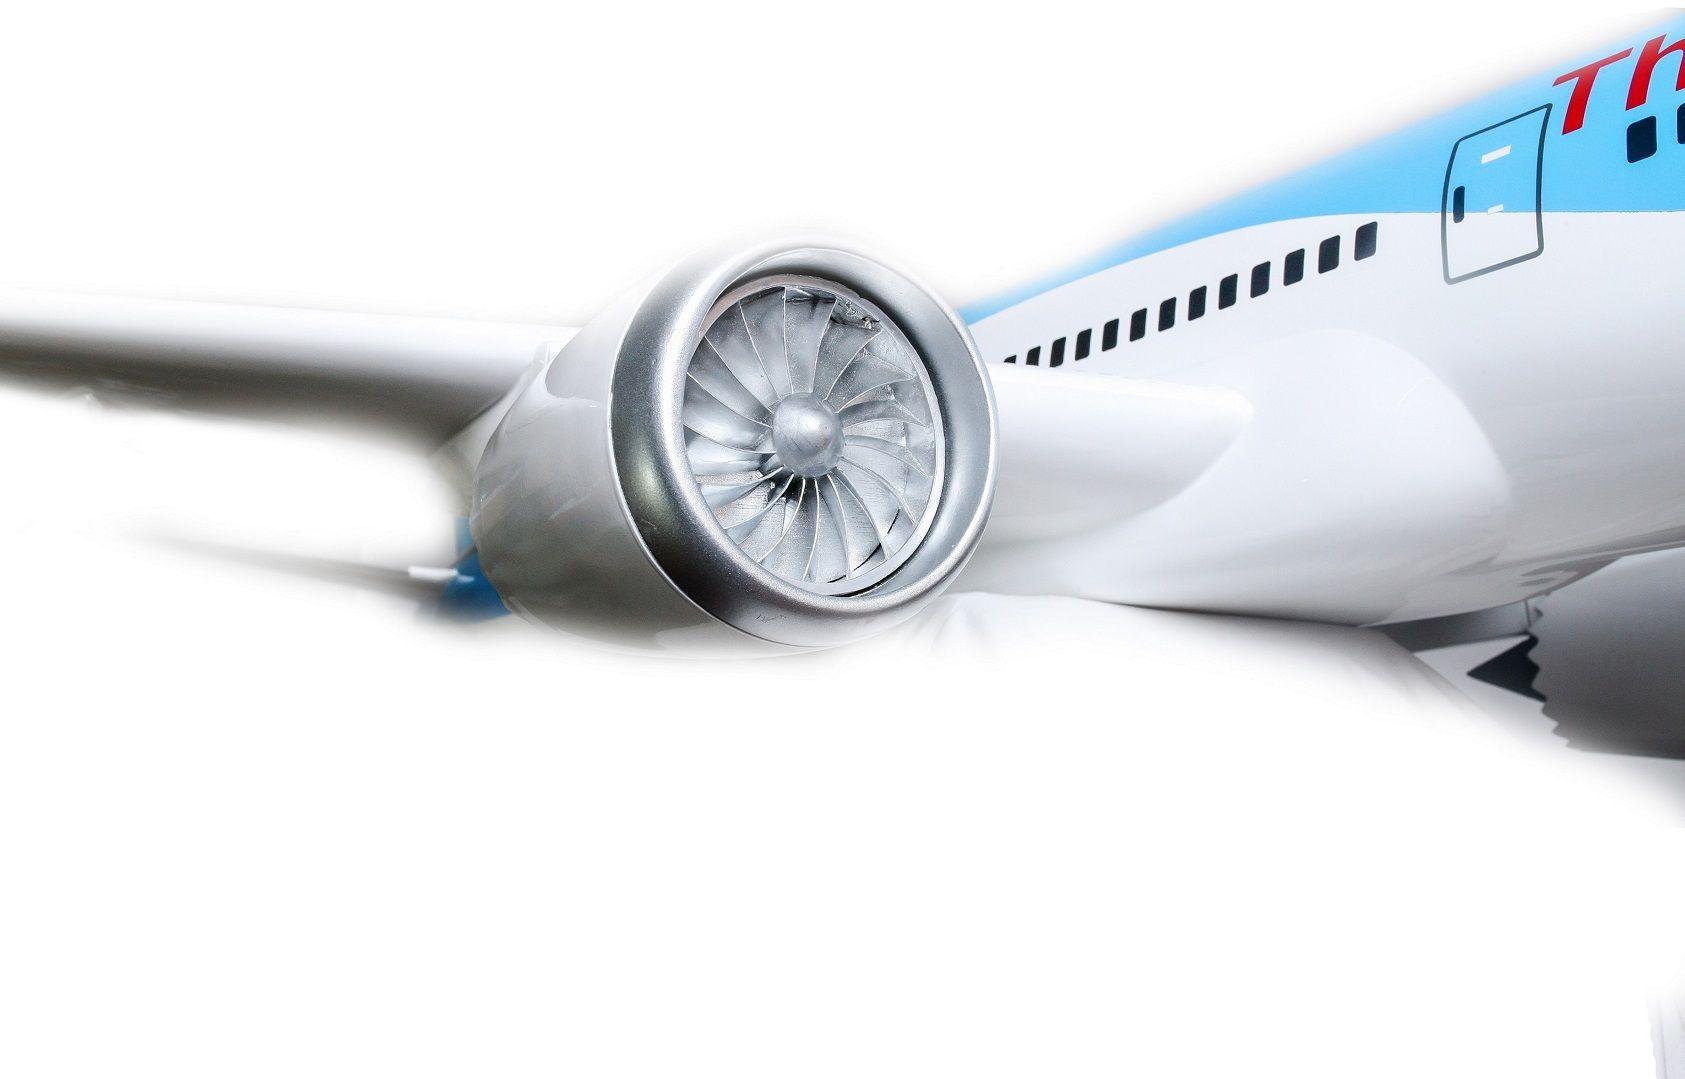 1525-9142-Boeing-787-800-Thomson-Airways-Model-Plane